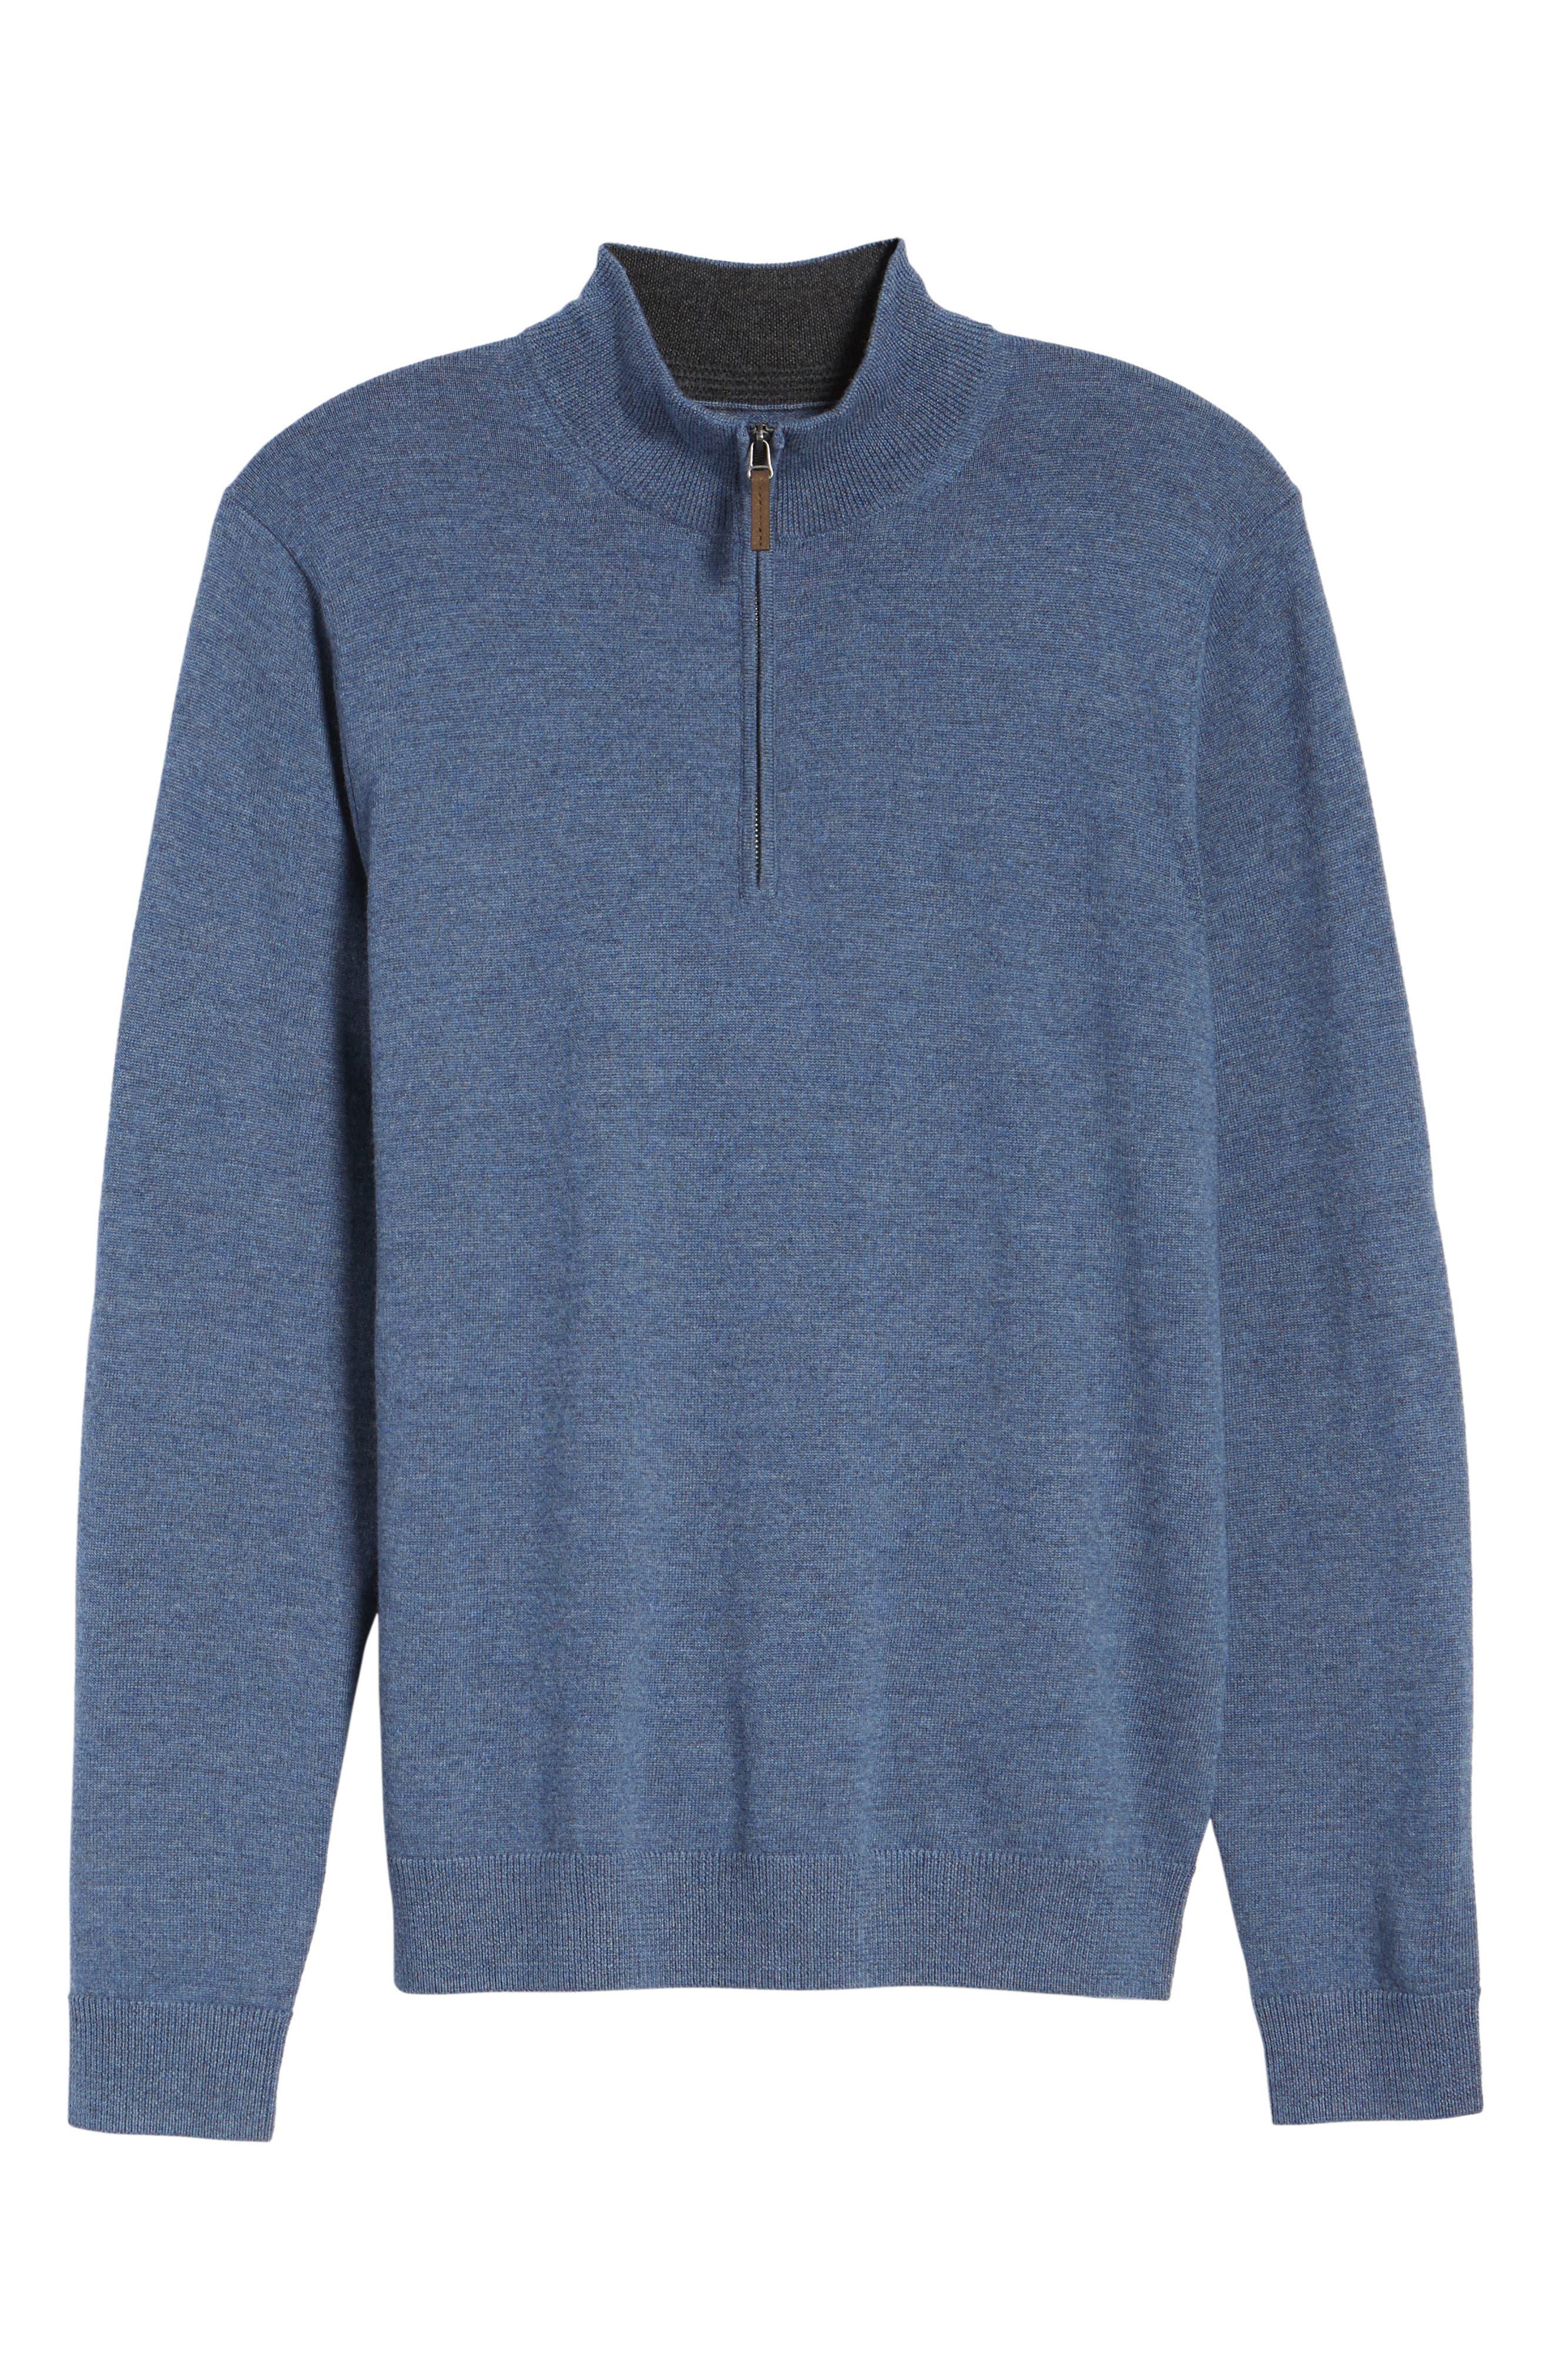 Quarter Zip Merino Wool Pullover,                             Alternate thumbnail 6, color,                             Navy Crown